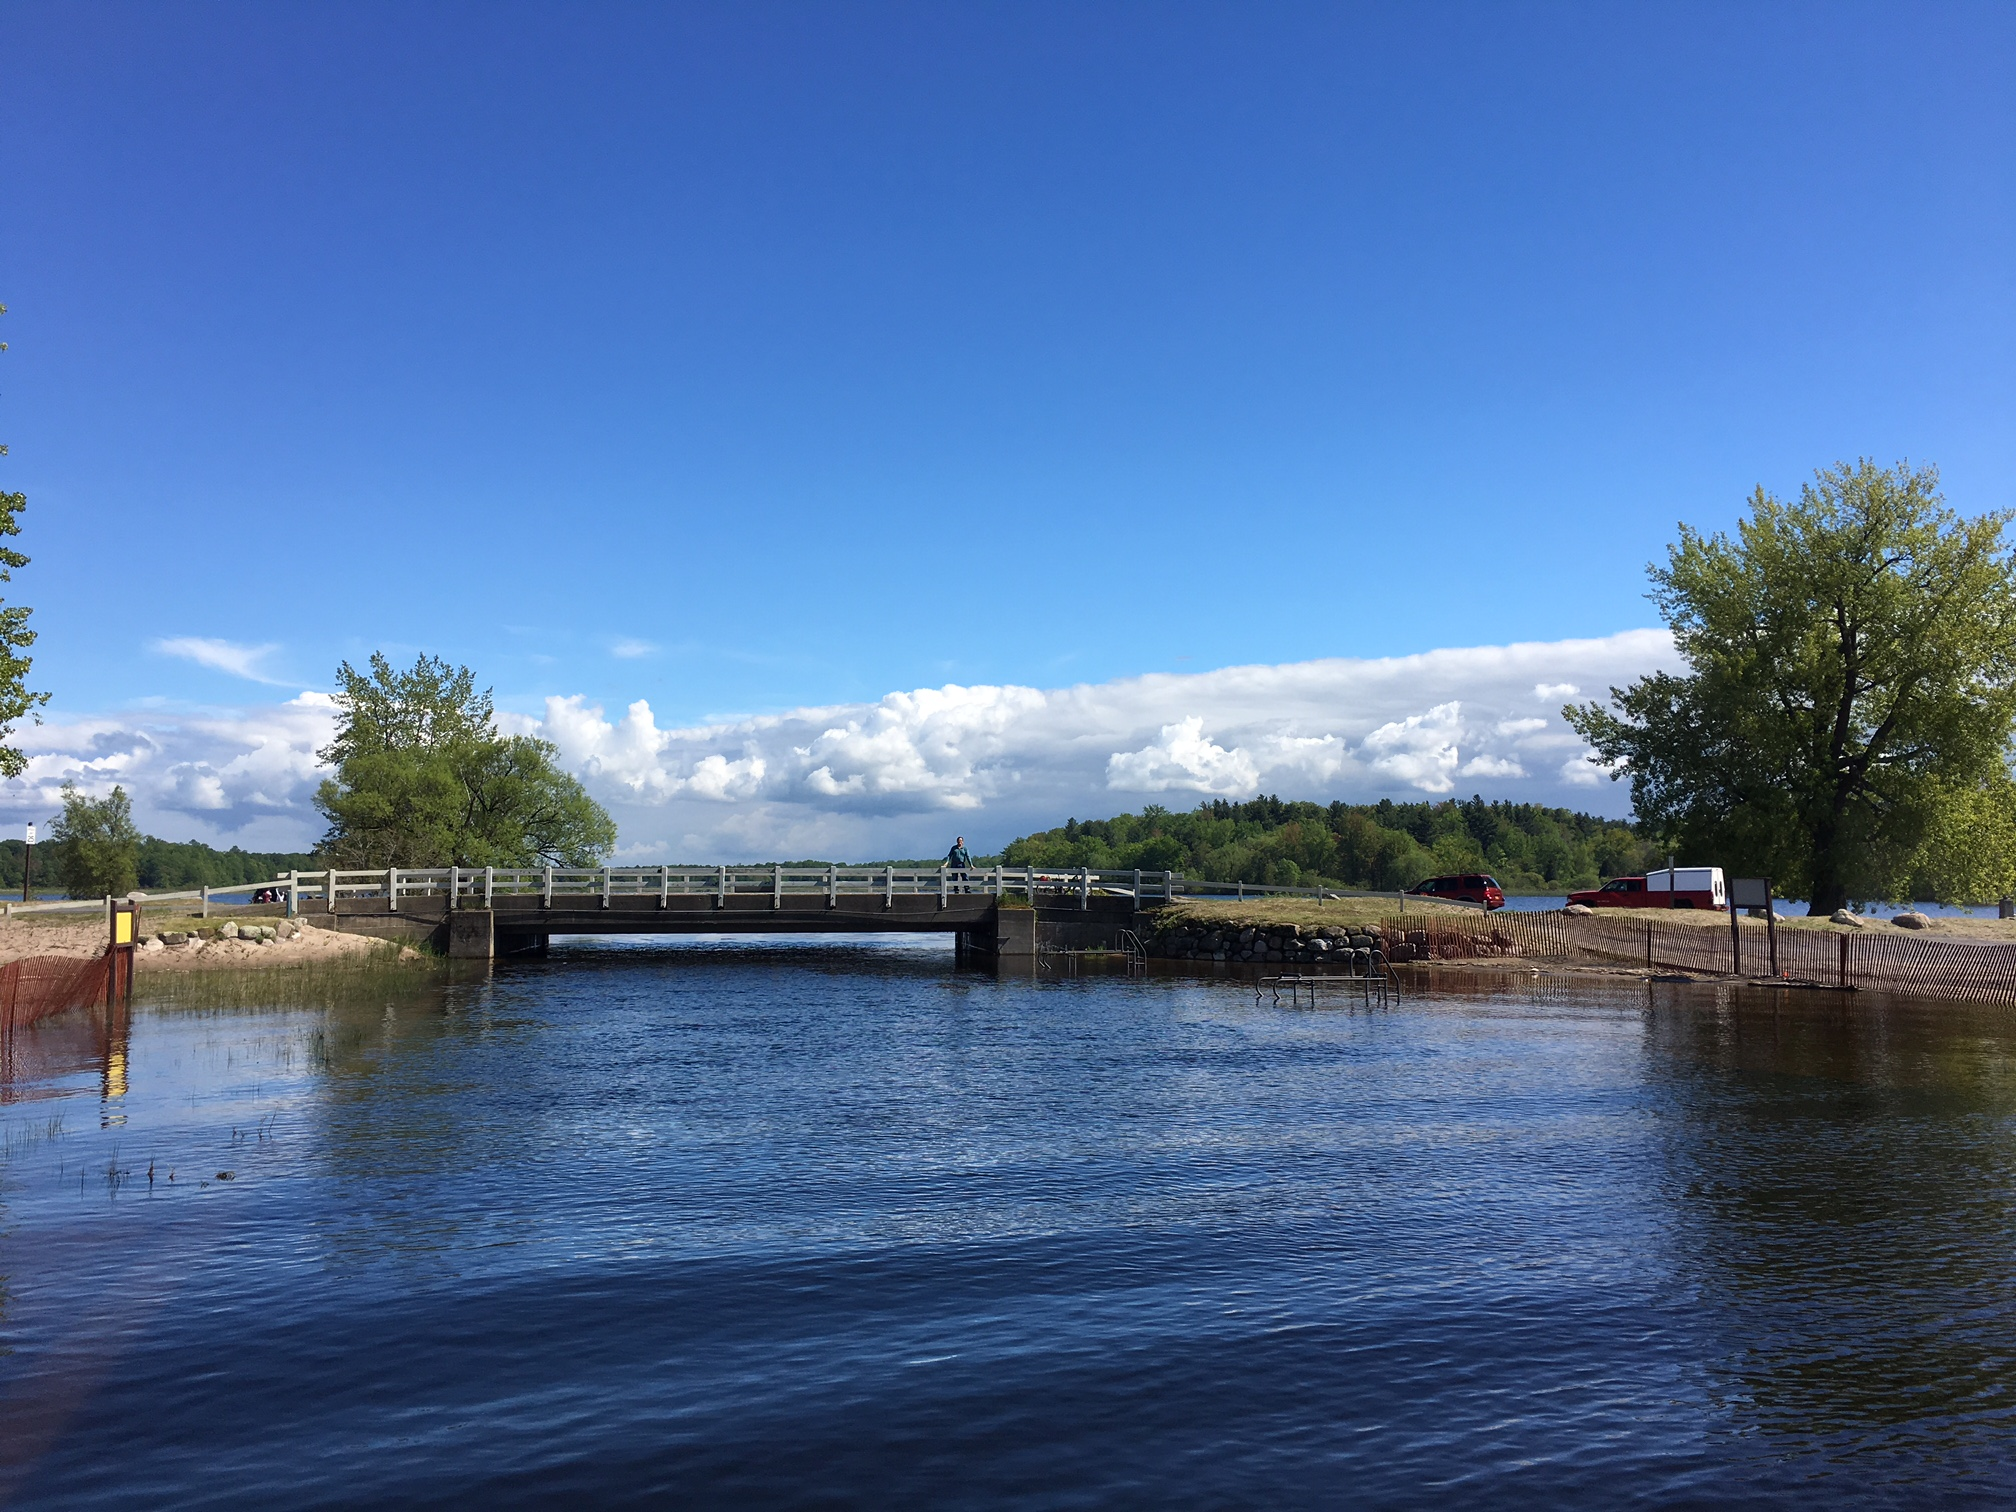 Fair Haven Beach, John is on the bridge..Lake Ontario is very high this year.